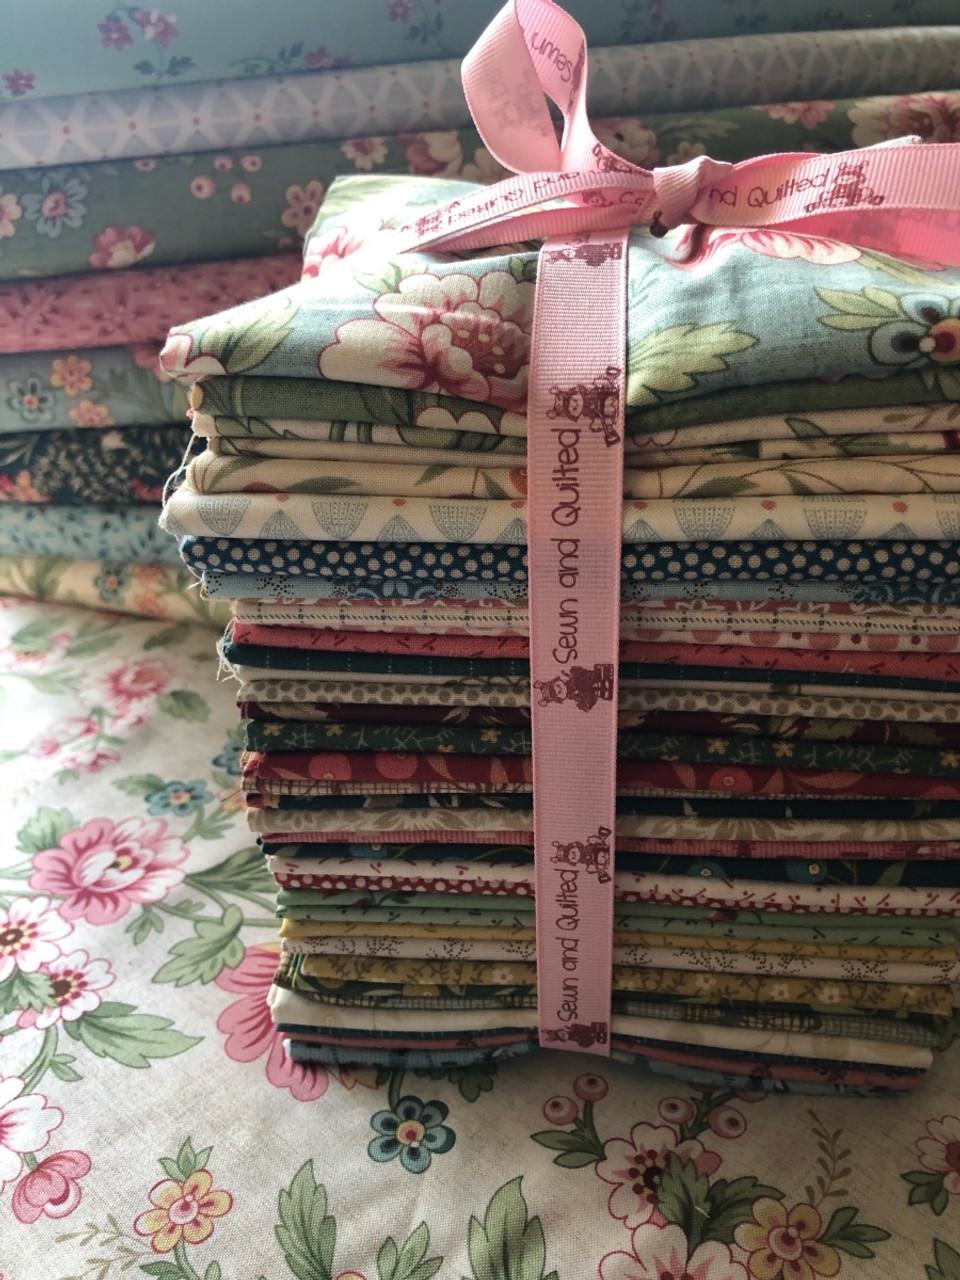 Edyta Sitar, Laundry Basket Quilts : The Seamstress - Fat Quarter Bundle